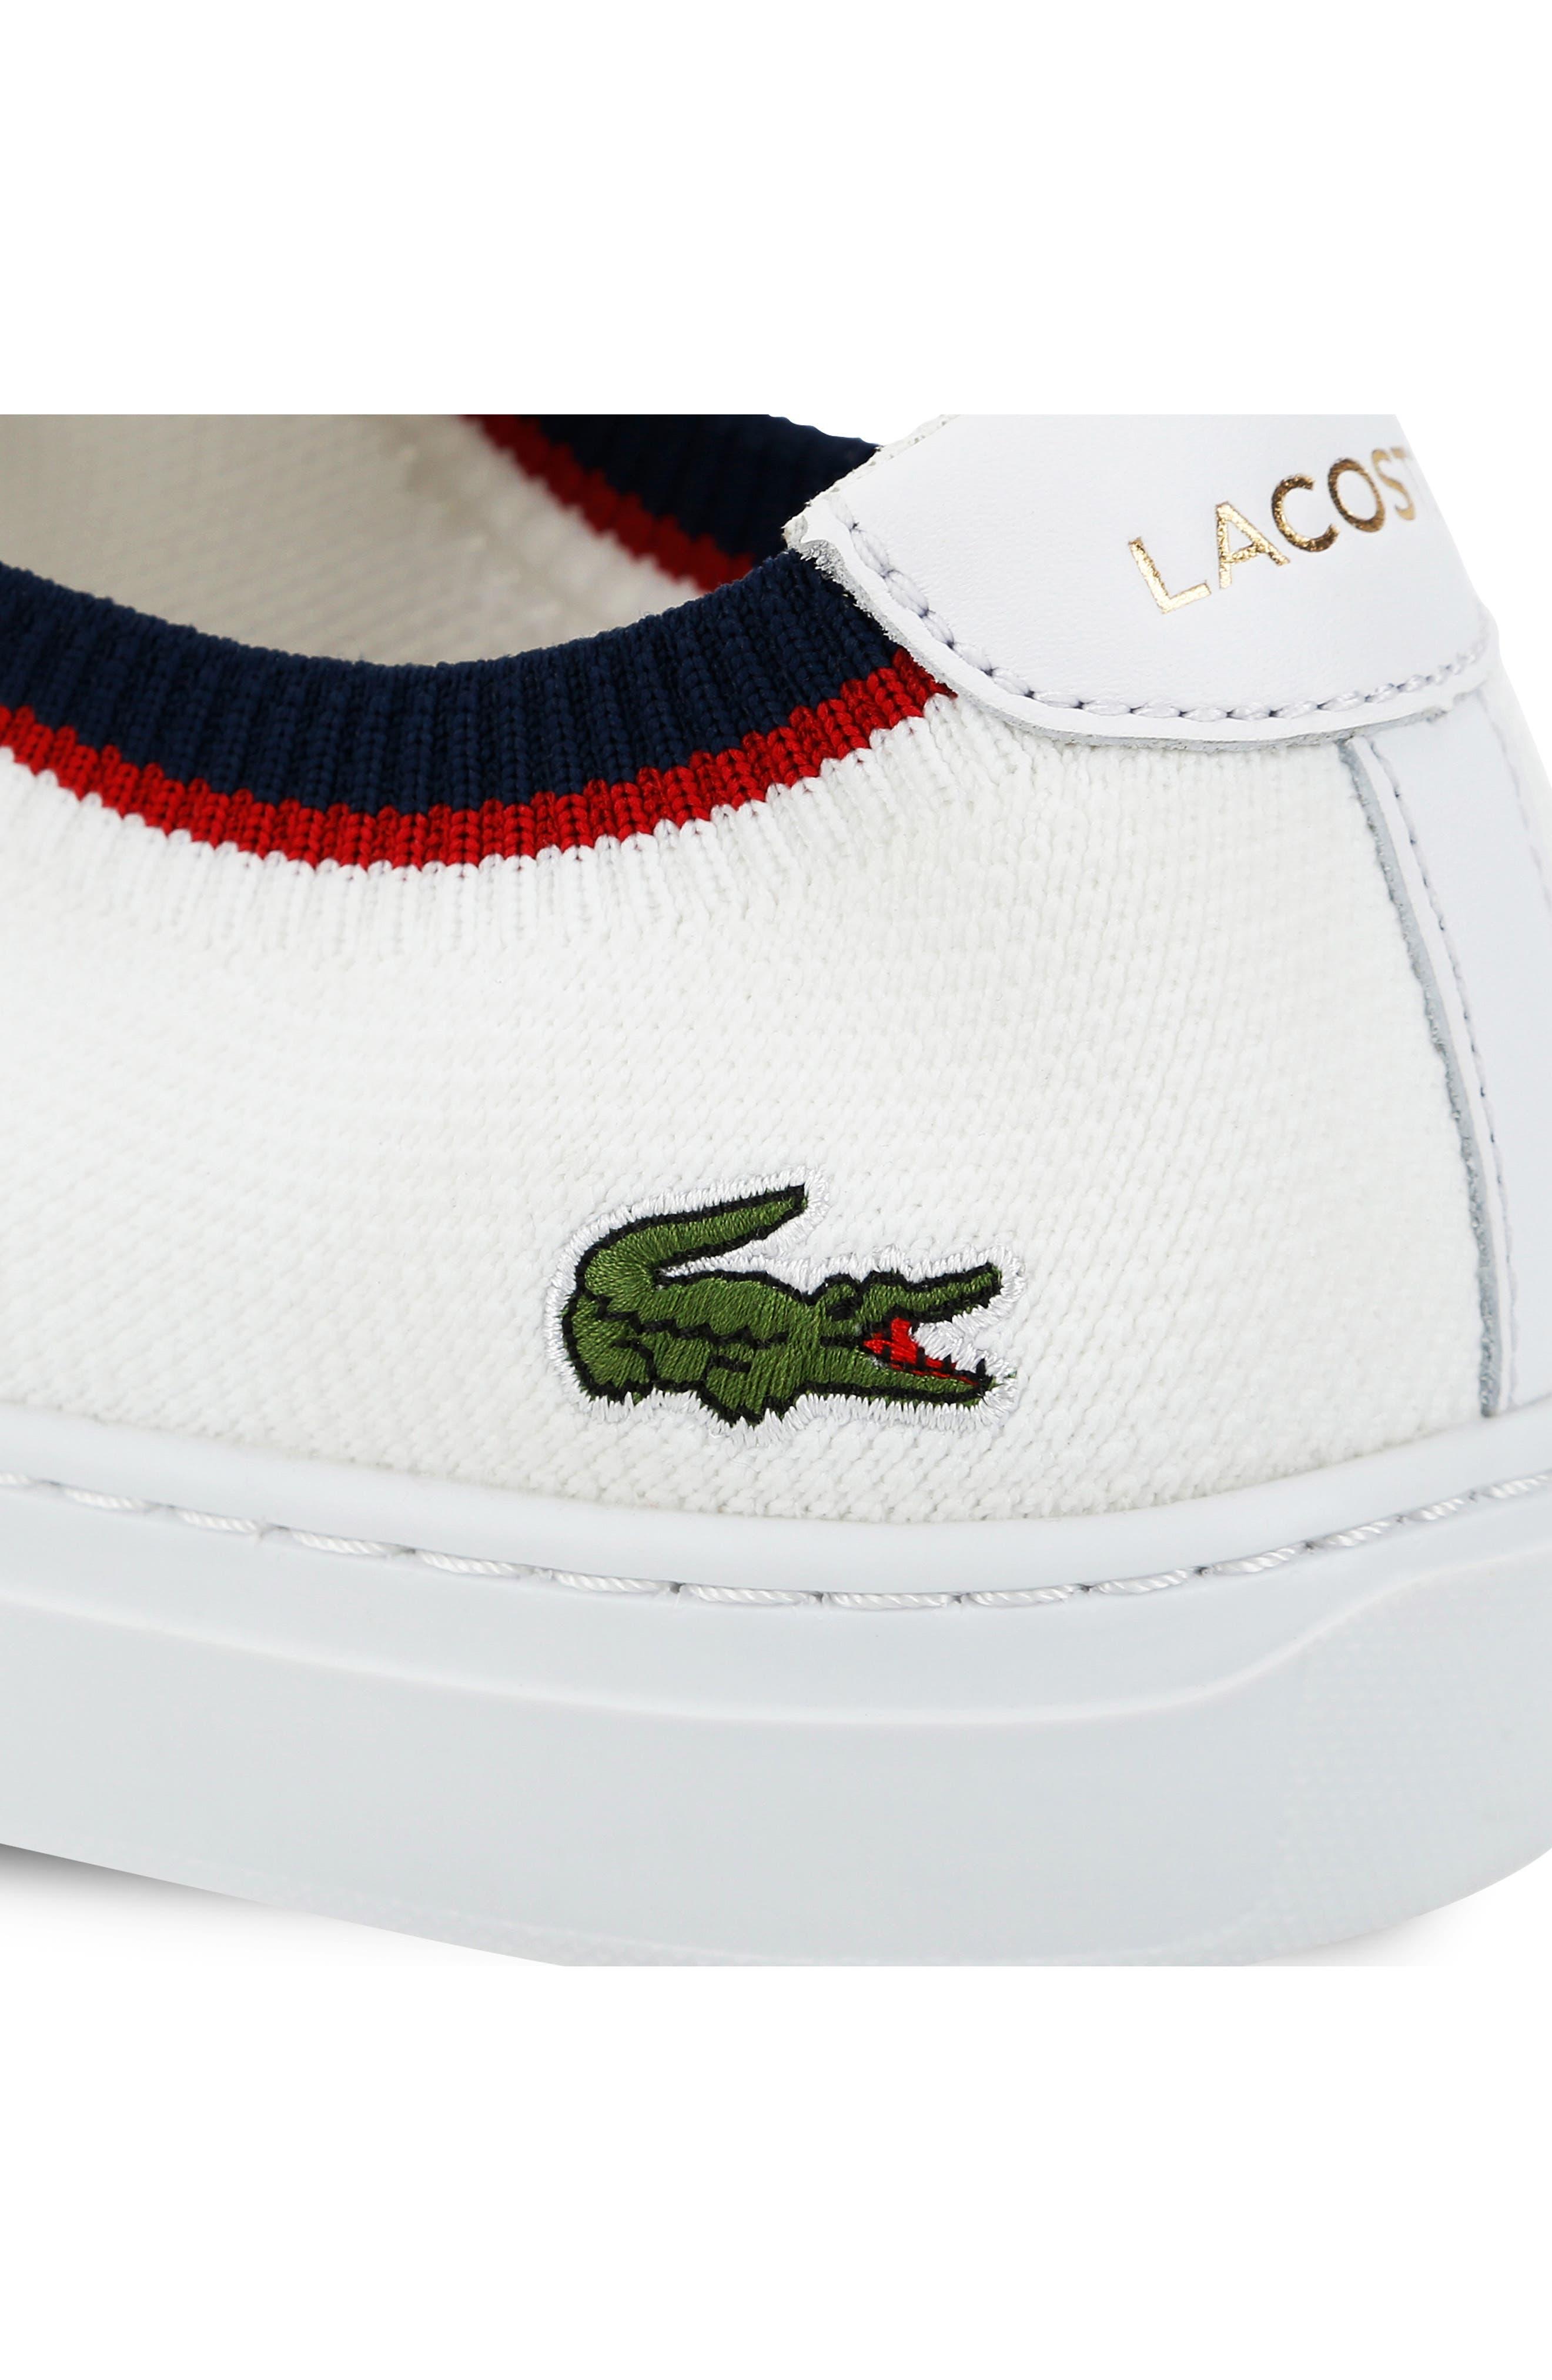 LACOSTE, Piqué Knit Sneaker, Alternate thumbnail 7, color, WHITE/ NAVY/ RED